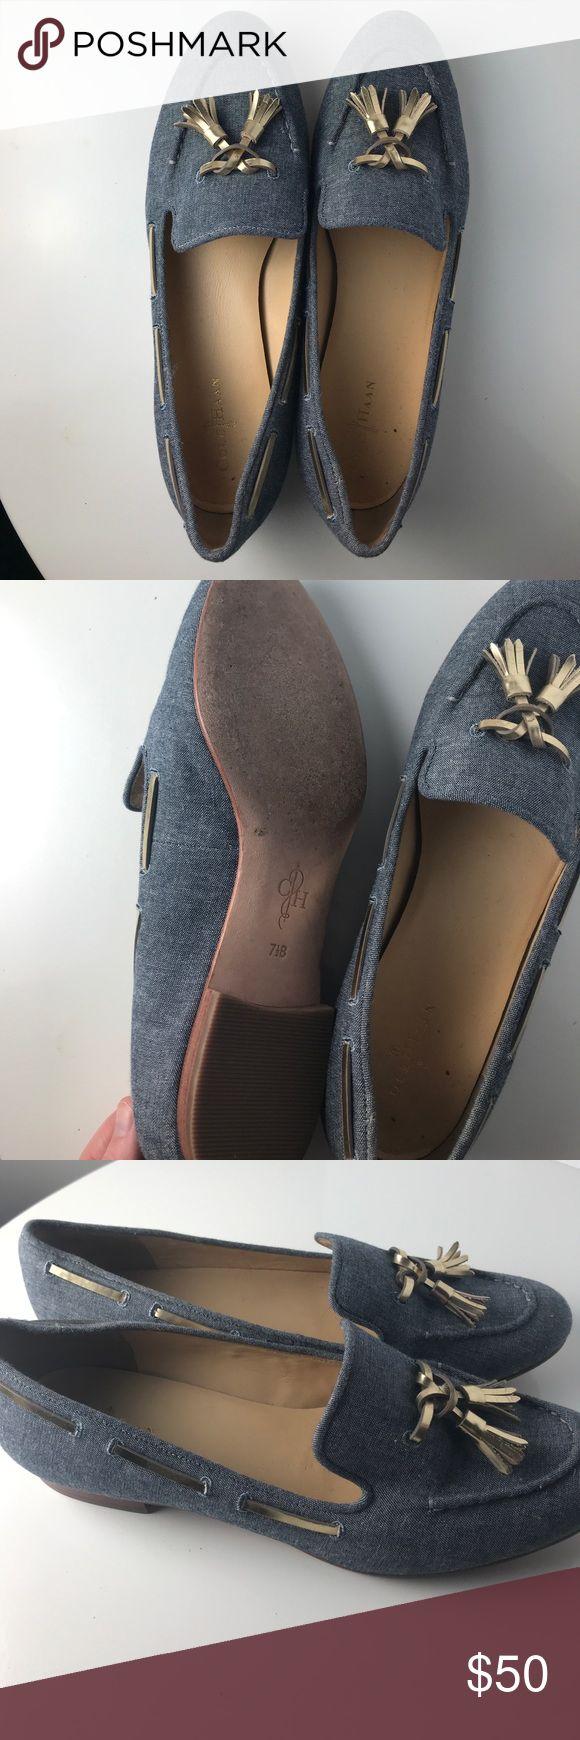 Cole Haan light navy loafers Cole Haan light navy loafers Cole Haan Shoes Flats & Loafers